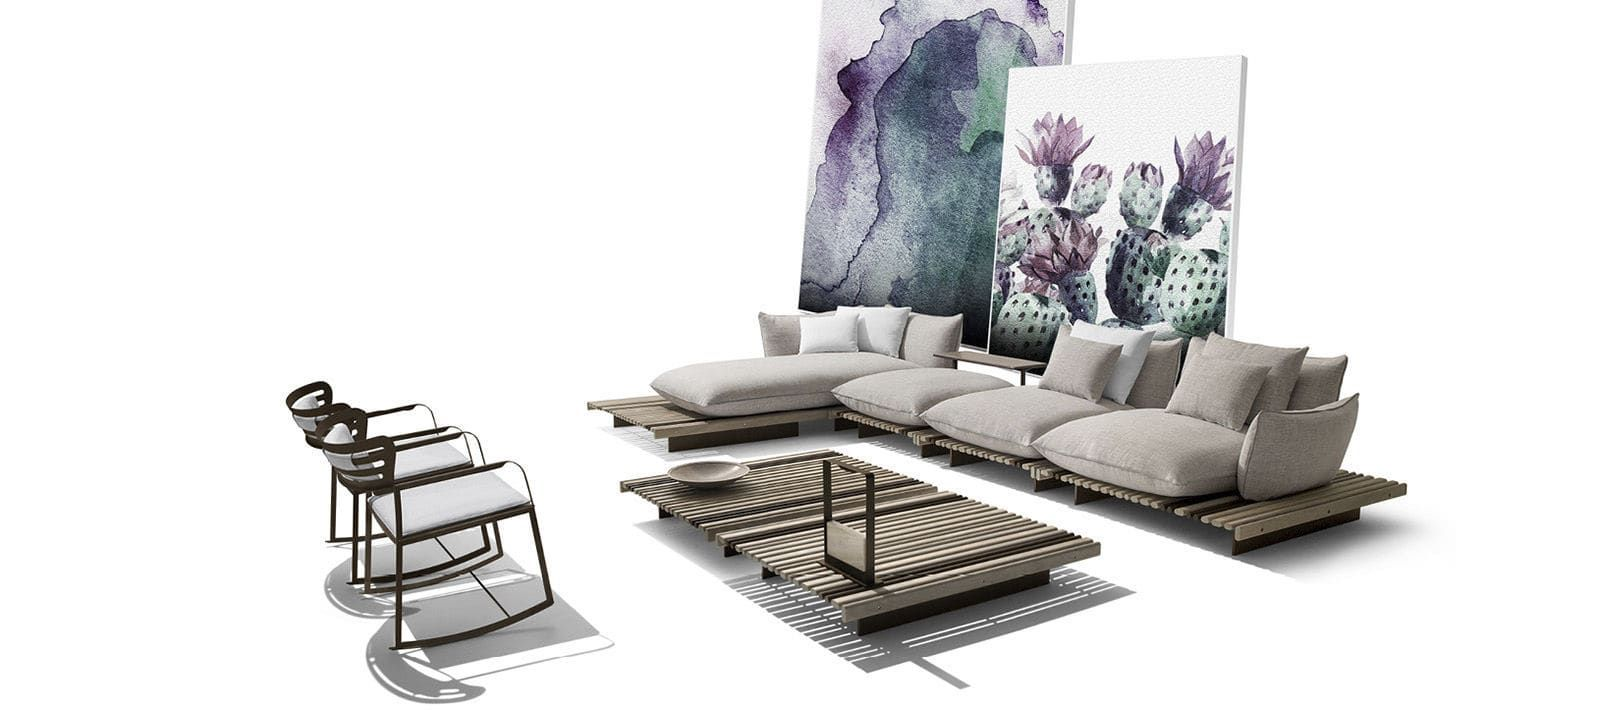 Apsara, refine outdoor design signed (con